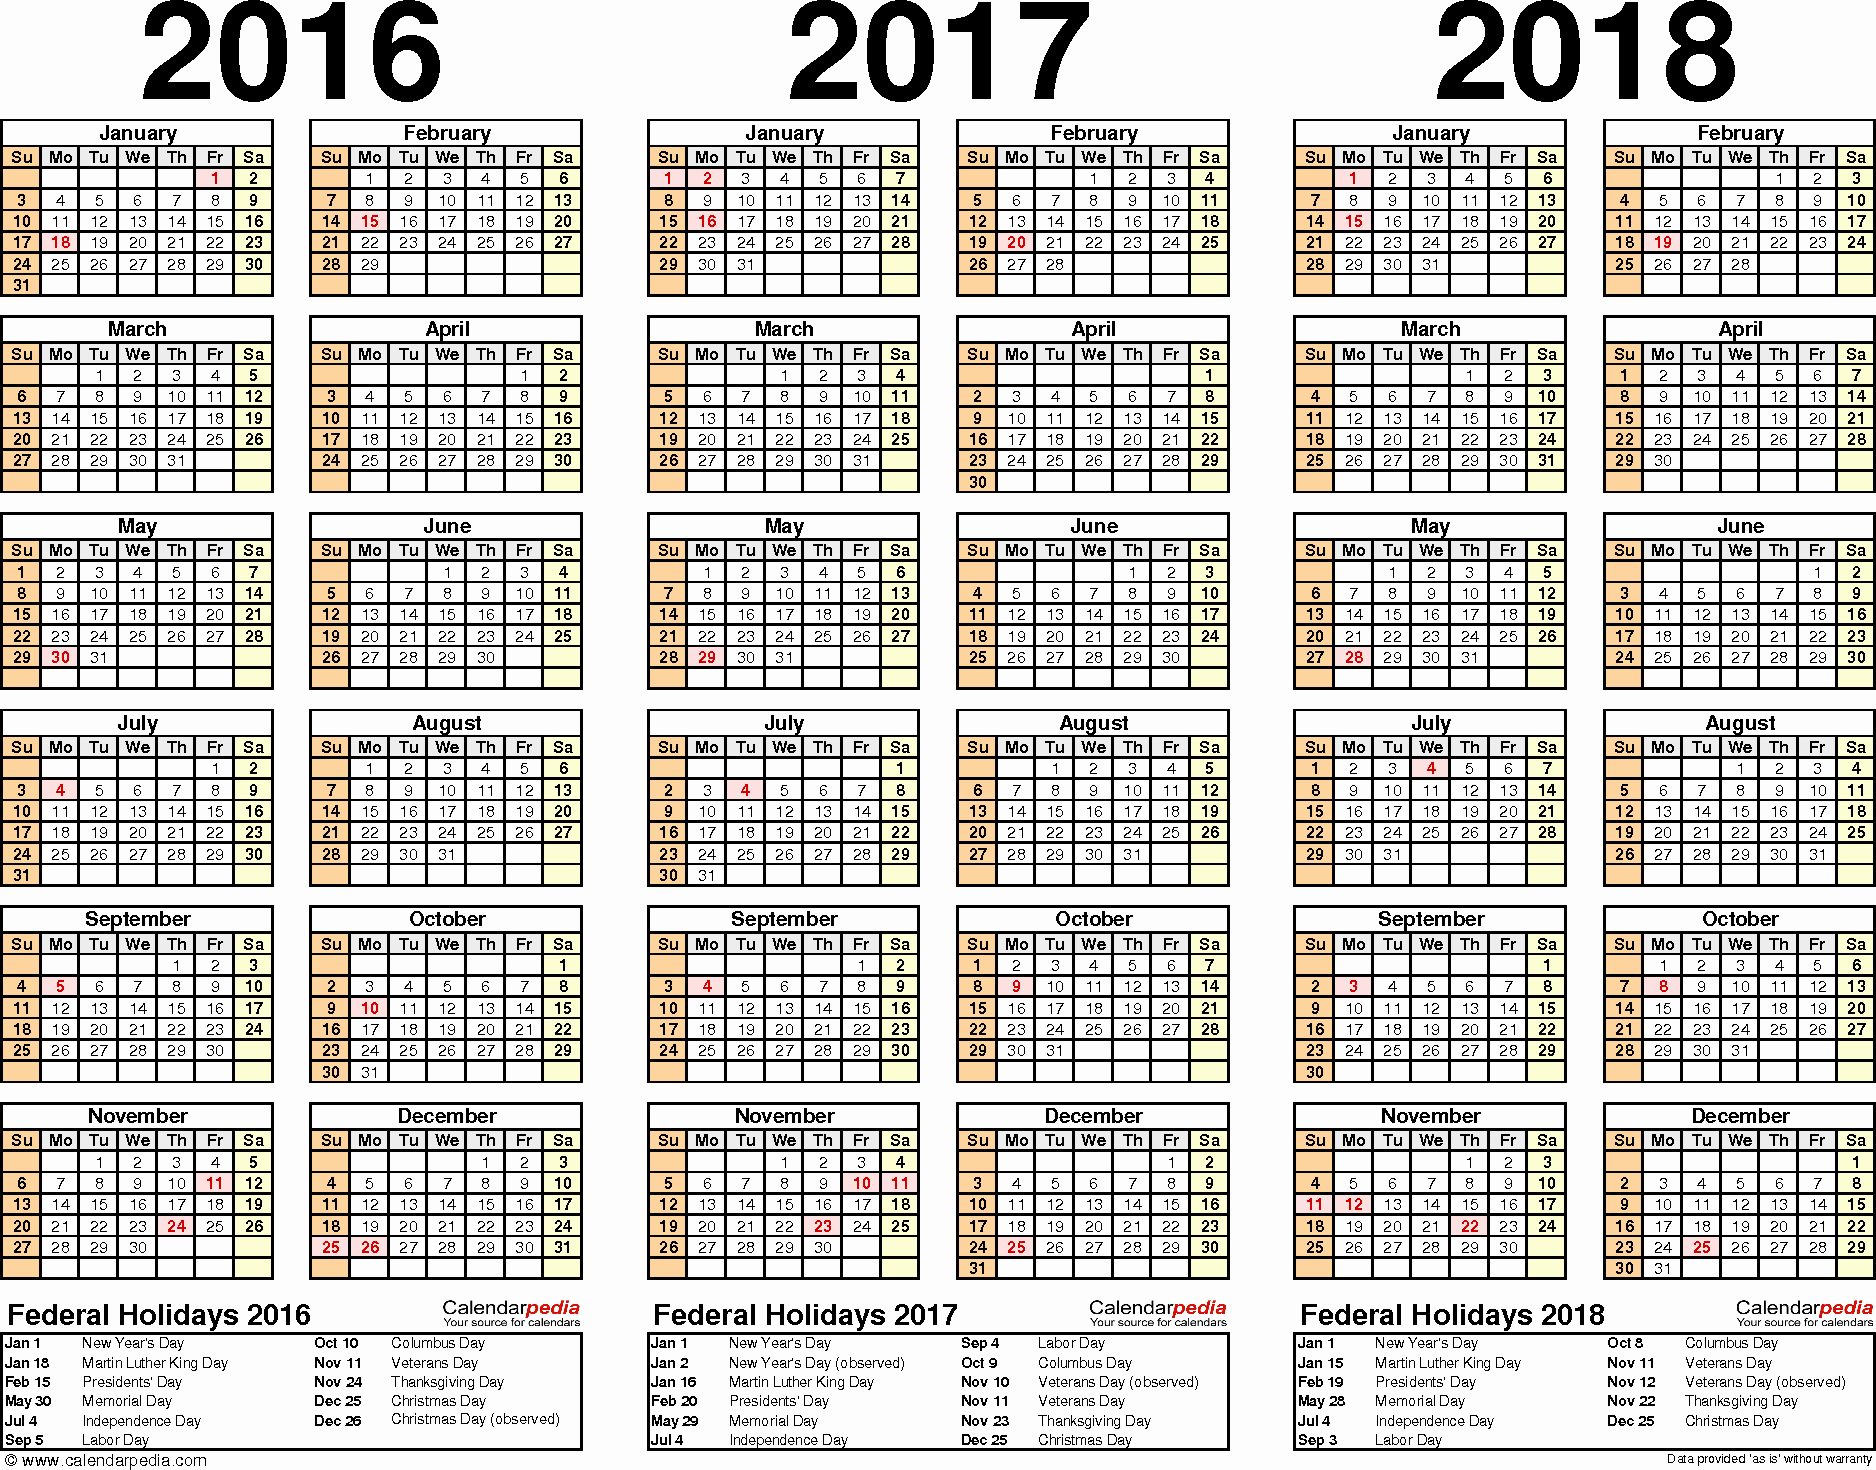 5 Year Calendar Starting 2016 Fresh 2016 2017 2018 Calendar 4 Three Year Printable Pdf Calendars